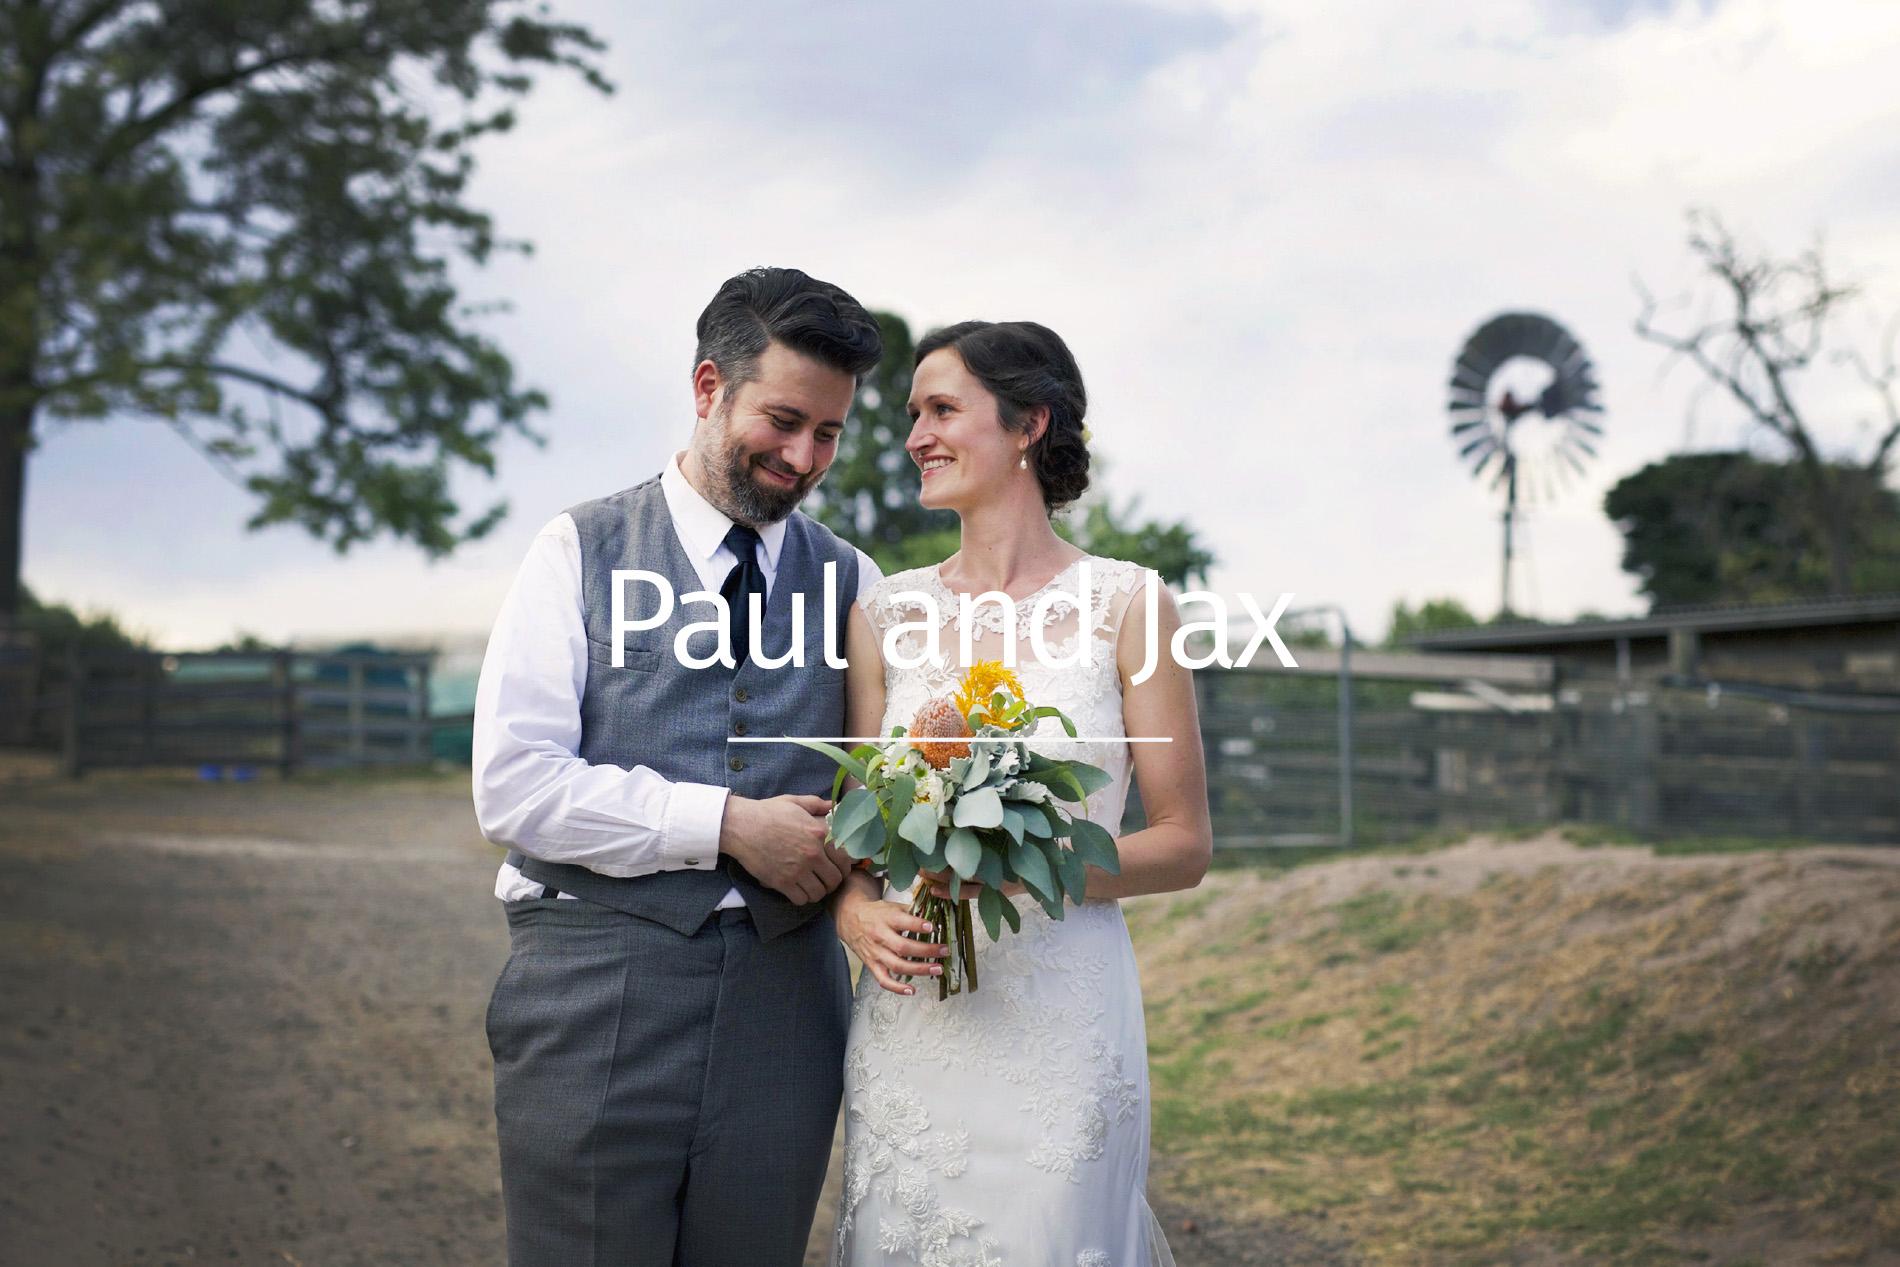 Paul and Jax